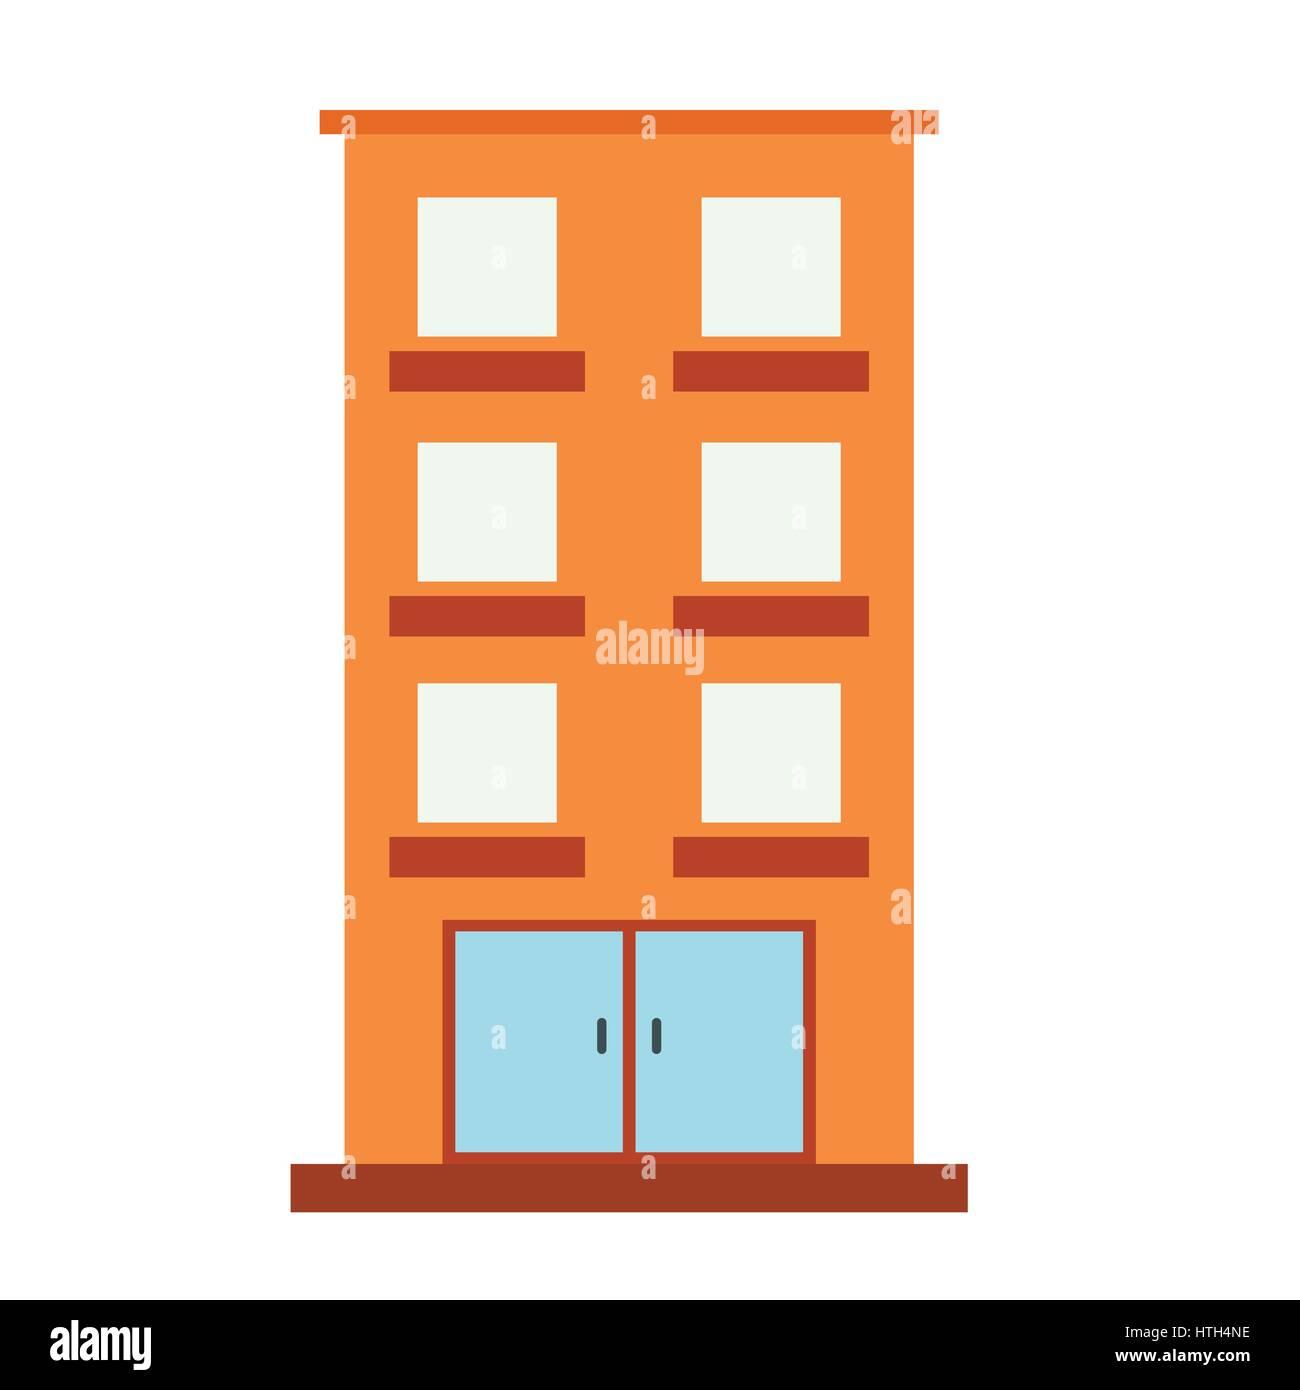 Three-storey house icon Stock Vector